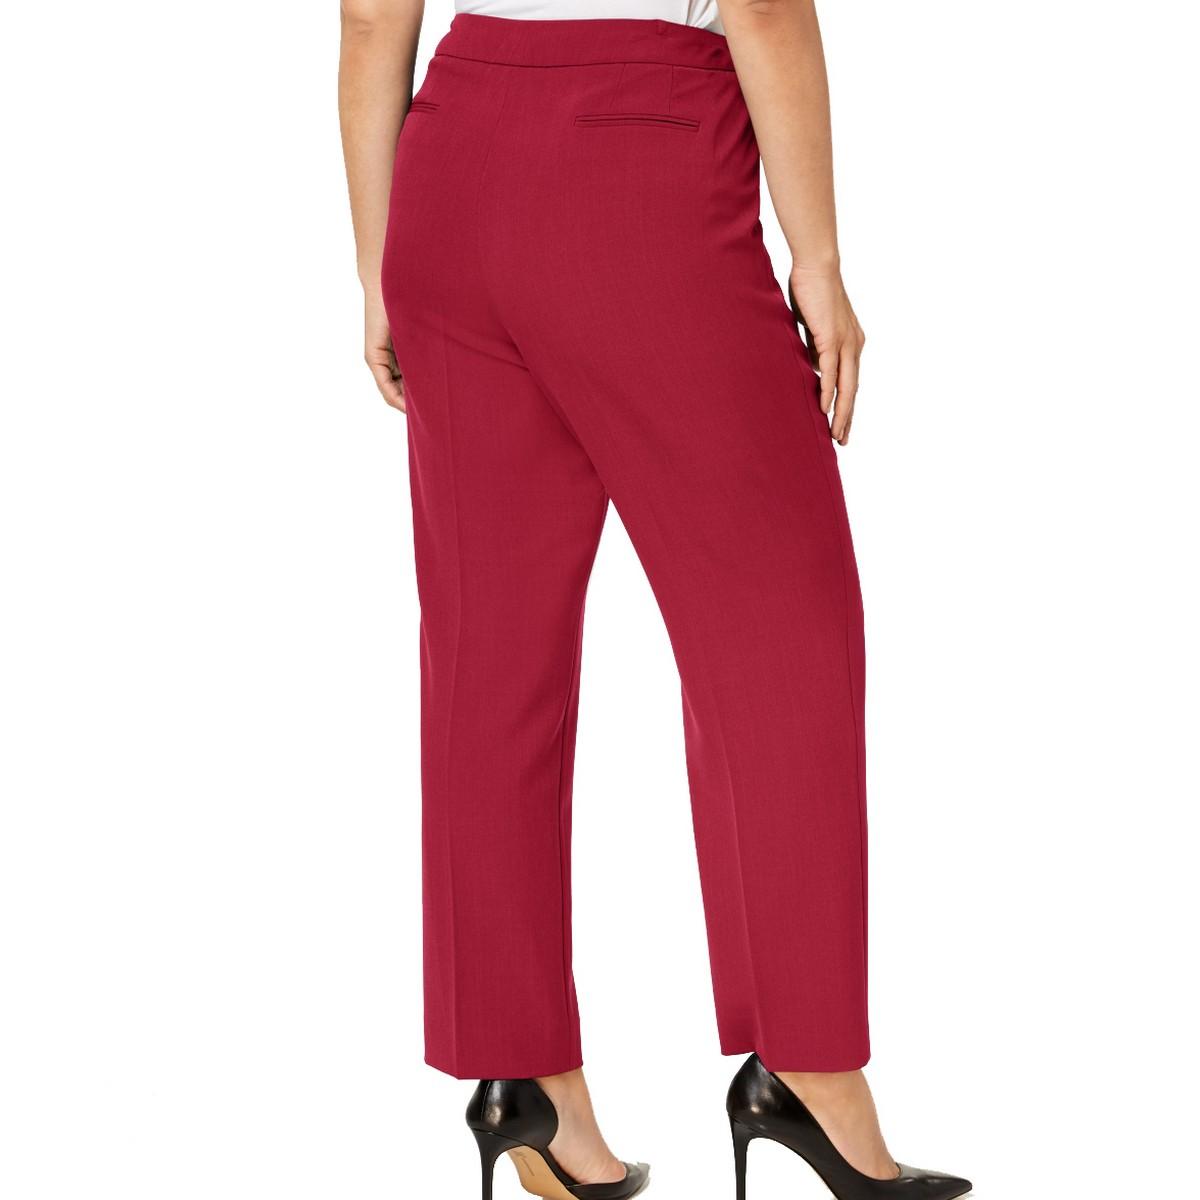 ANNE-KLEIN-NEW-Women-039-s-Plus-Size-Extended-tab-Dress-Pants-TEDO thumbnail 10